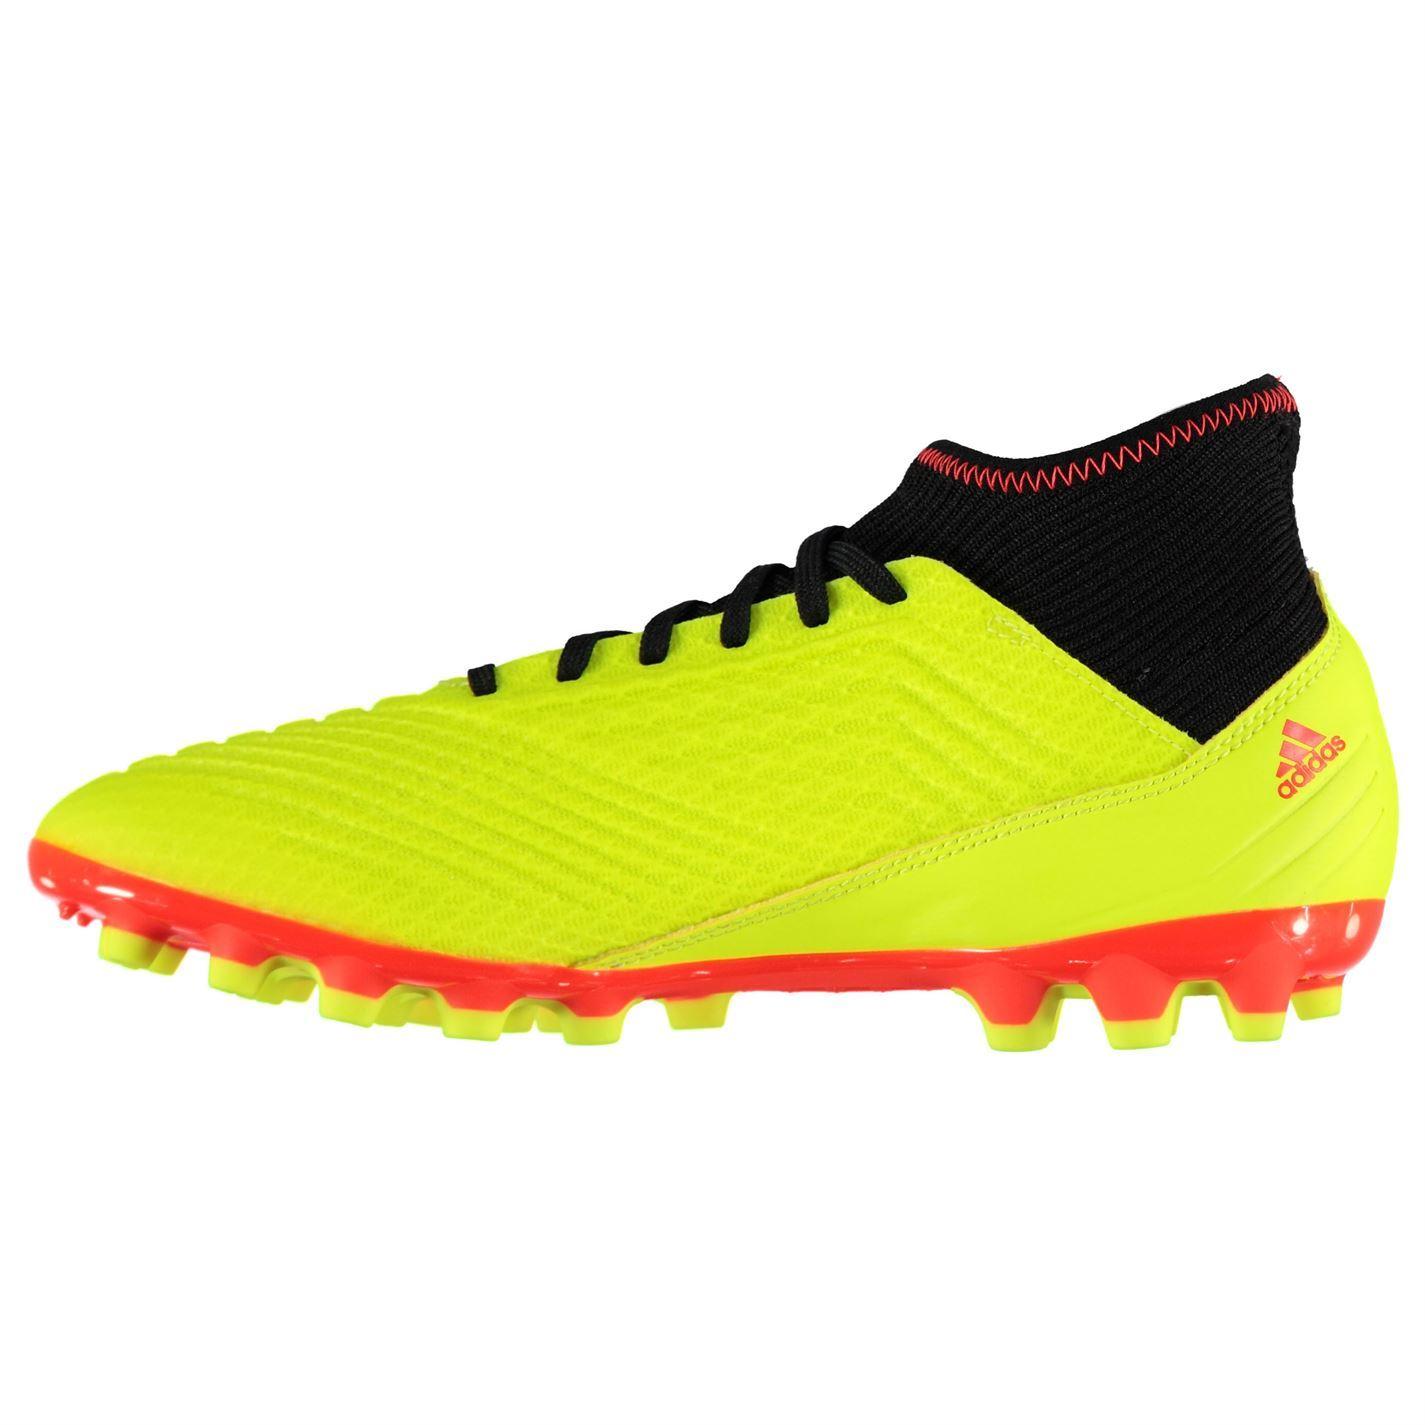 6aeec8b4f adidas Predator 18.3 AG AG Football Boots Mens Yellow Soccer Shoes Cleats